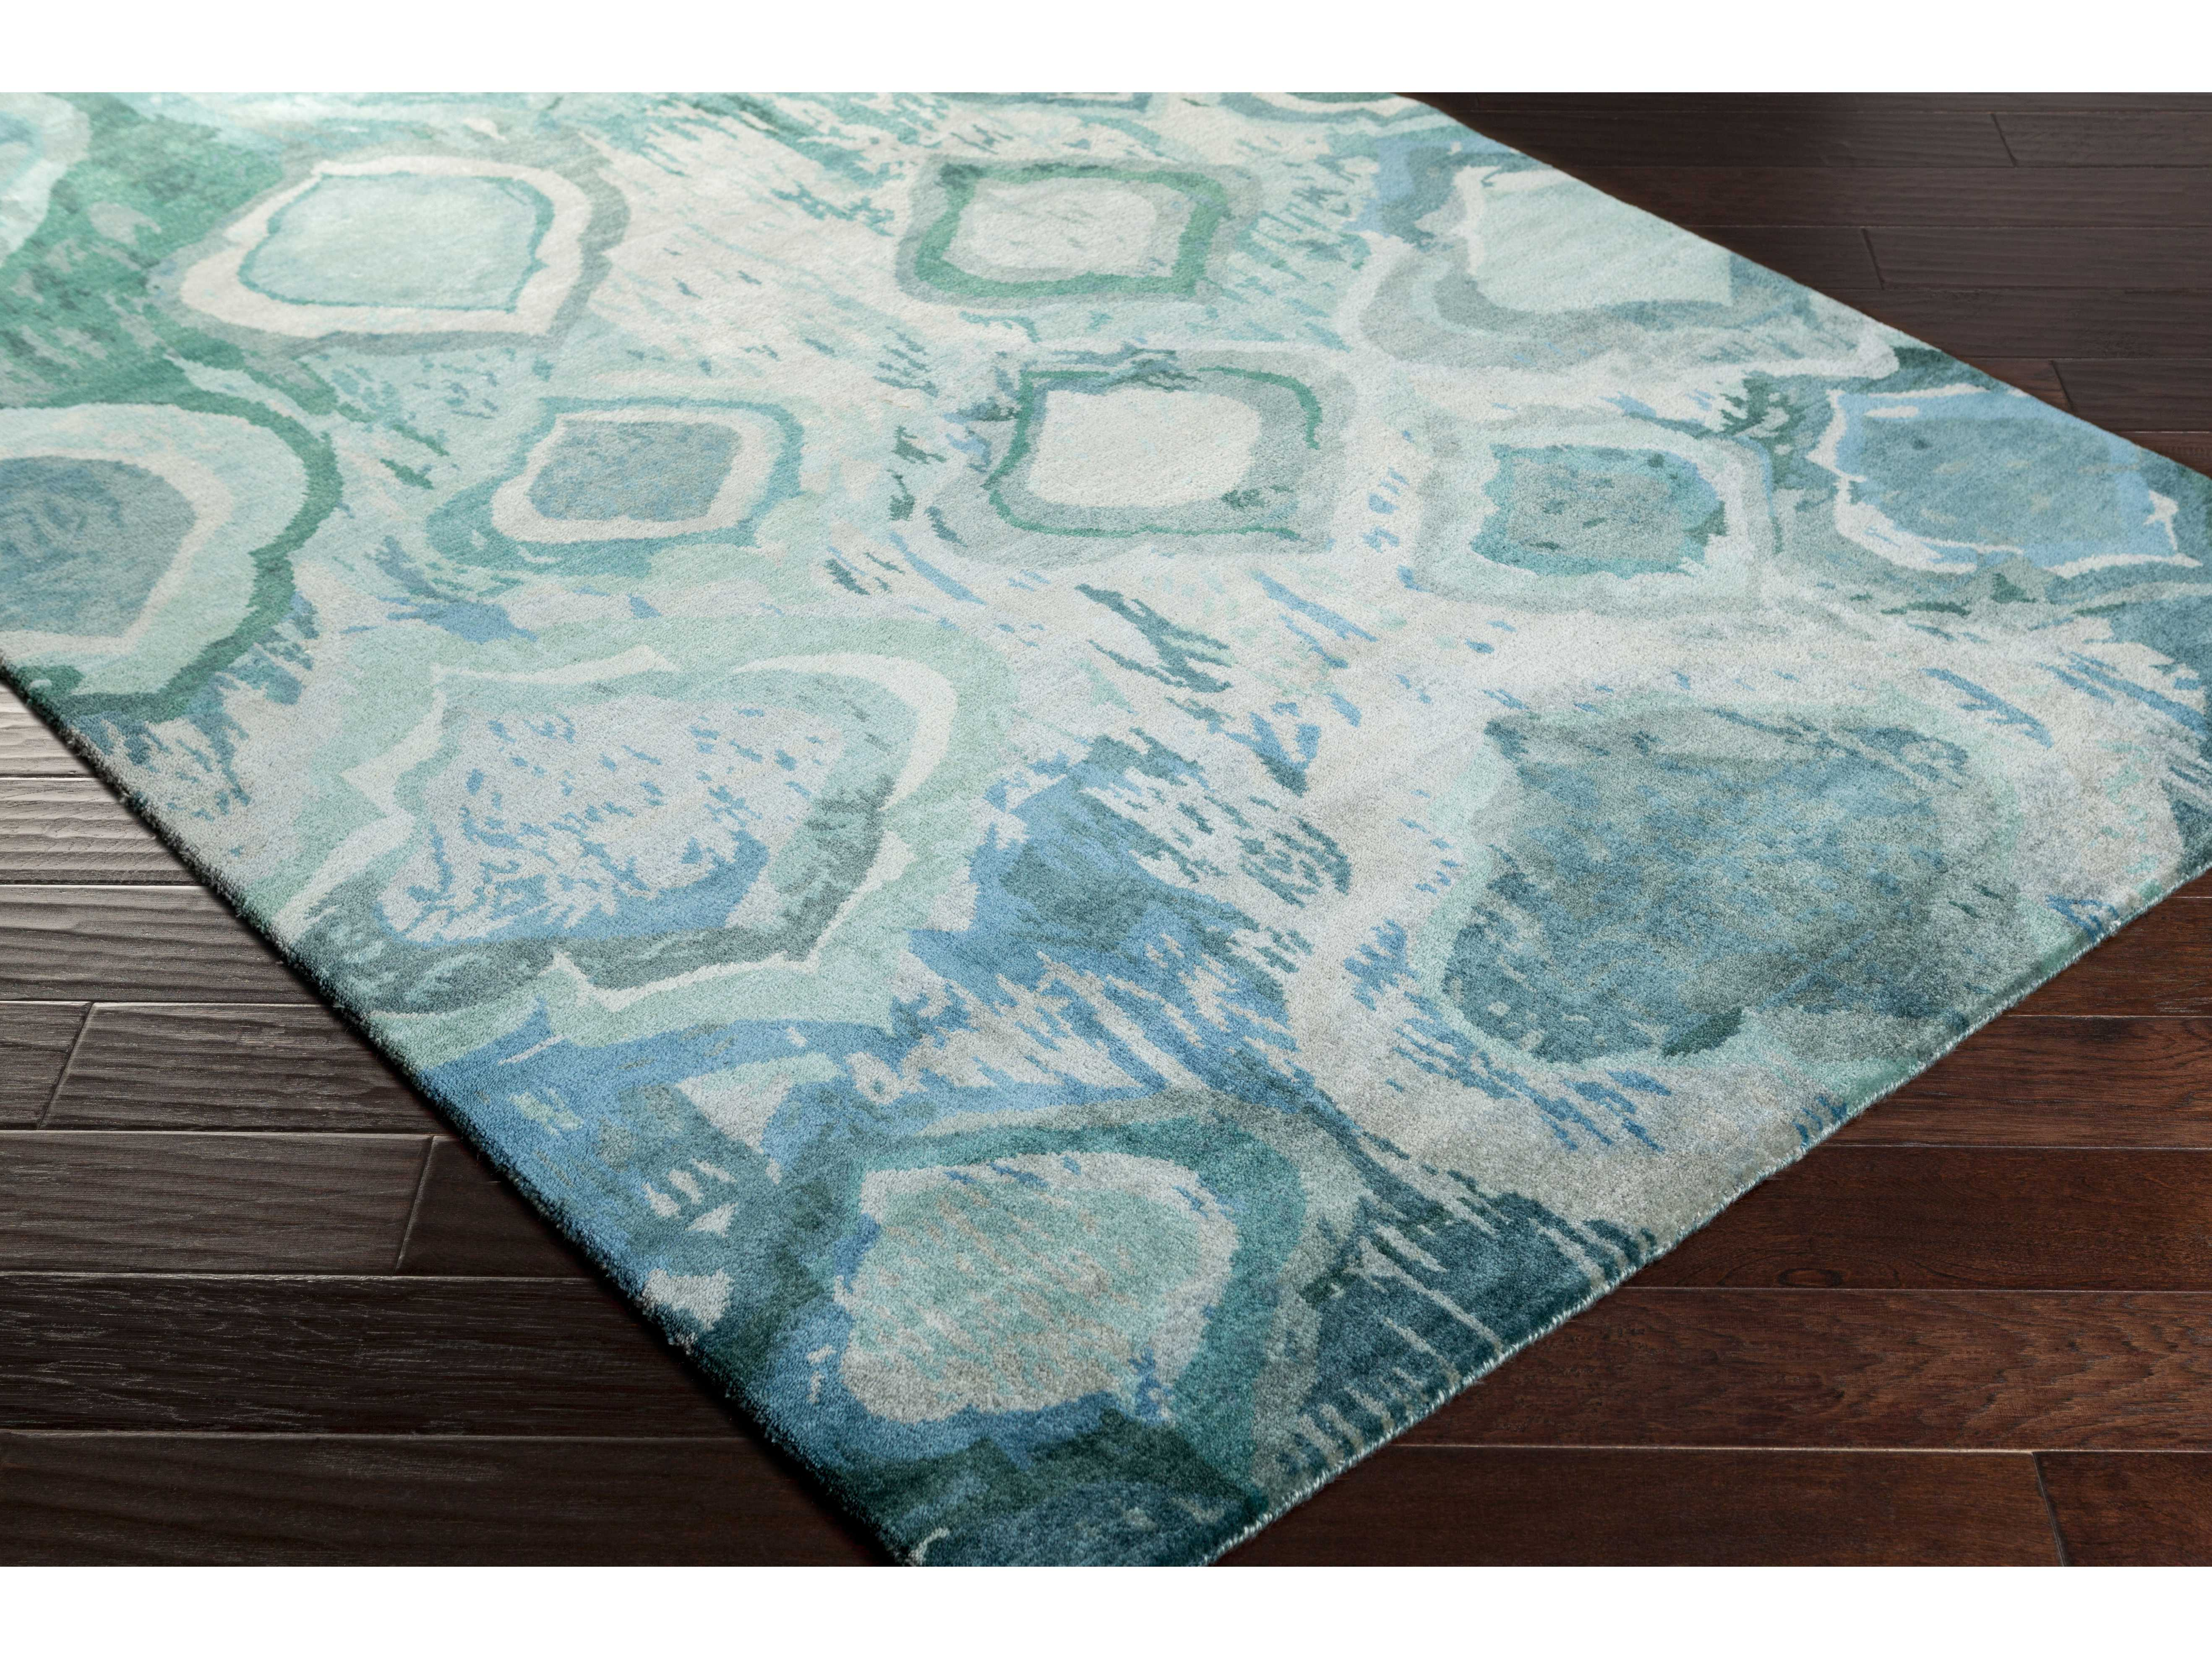 surya watercolor rectangular teal mint dark green area rug sywat5012rec. Black Bedroom Furniture Sets. Home Design Ideas